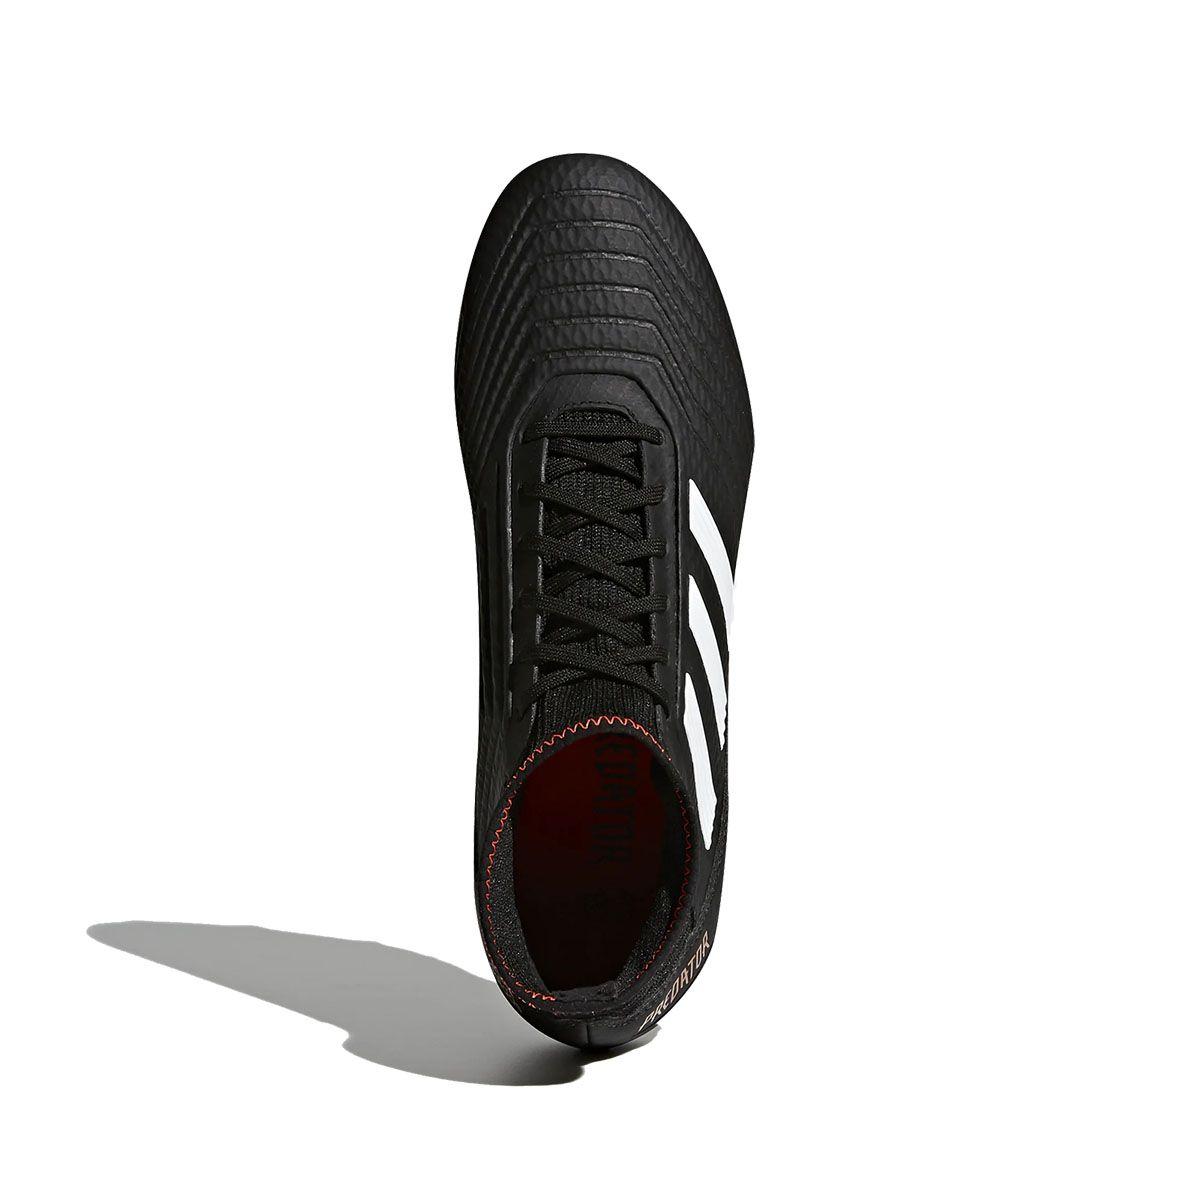 Chuteira Campo Adidas Predator 18.3 FG